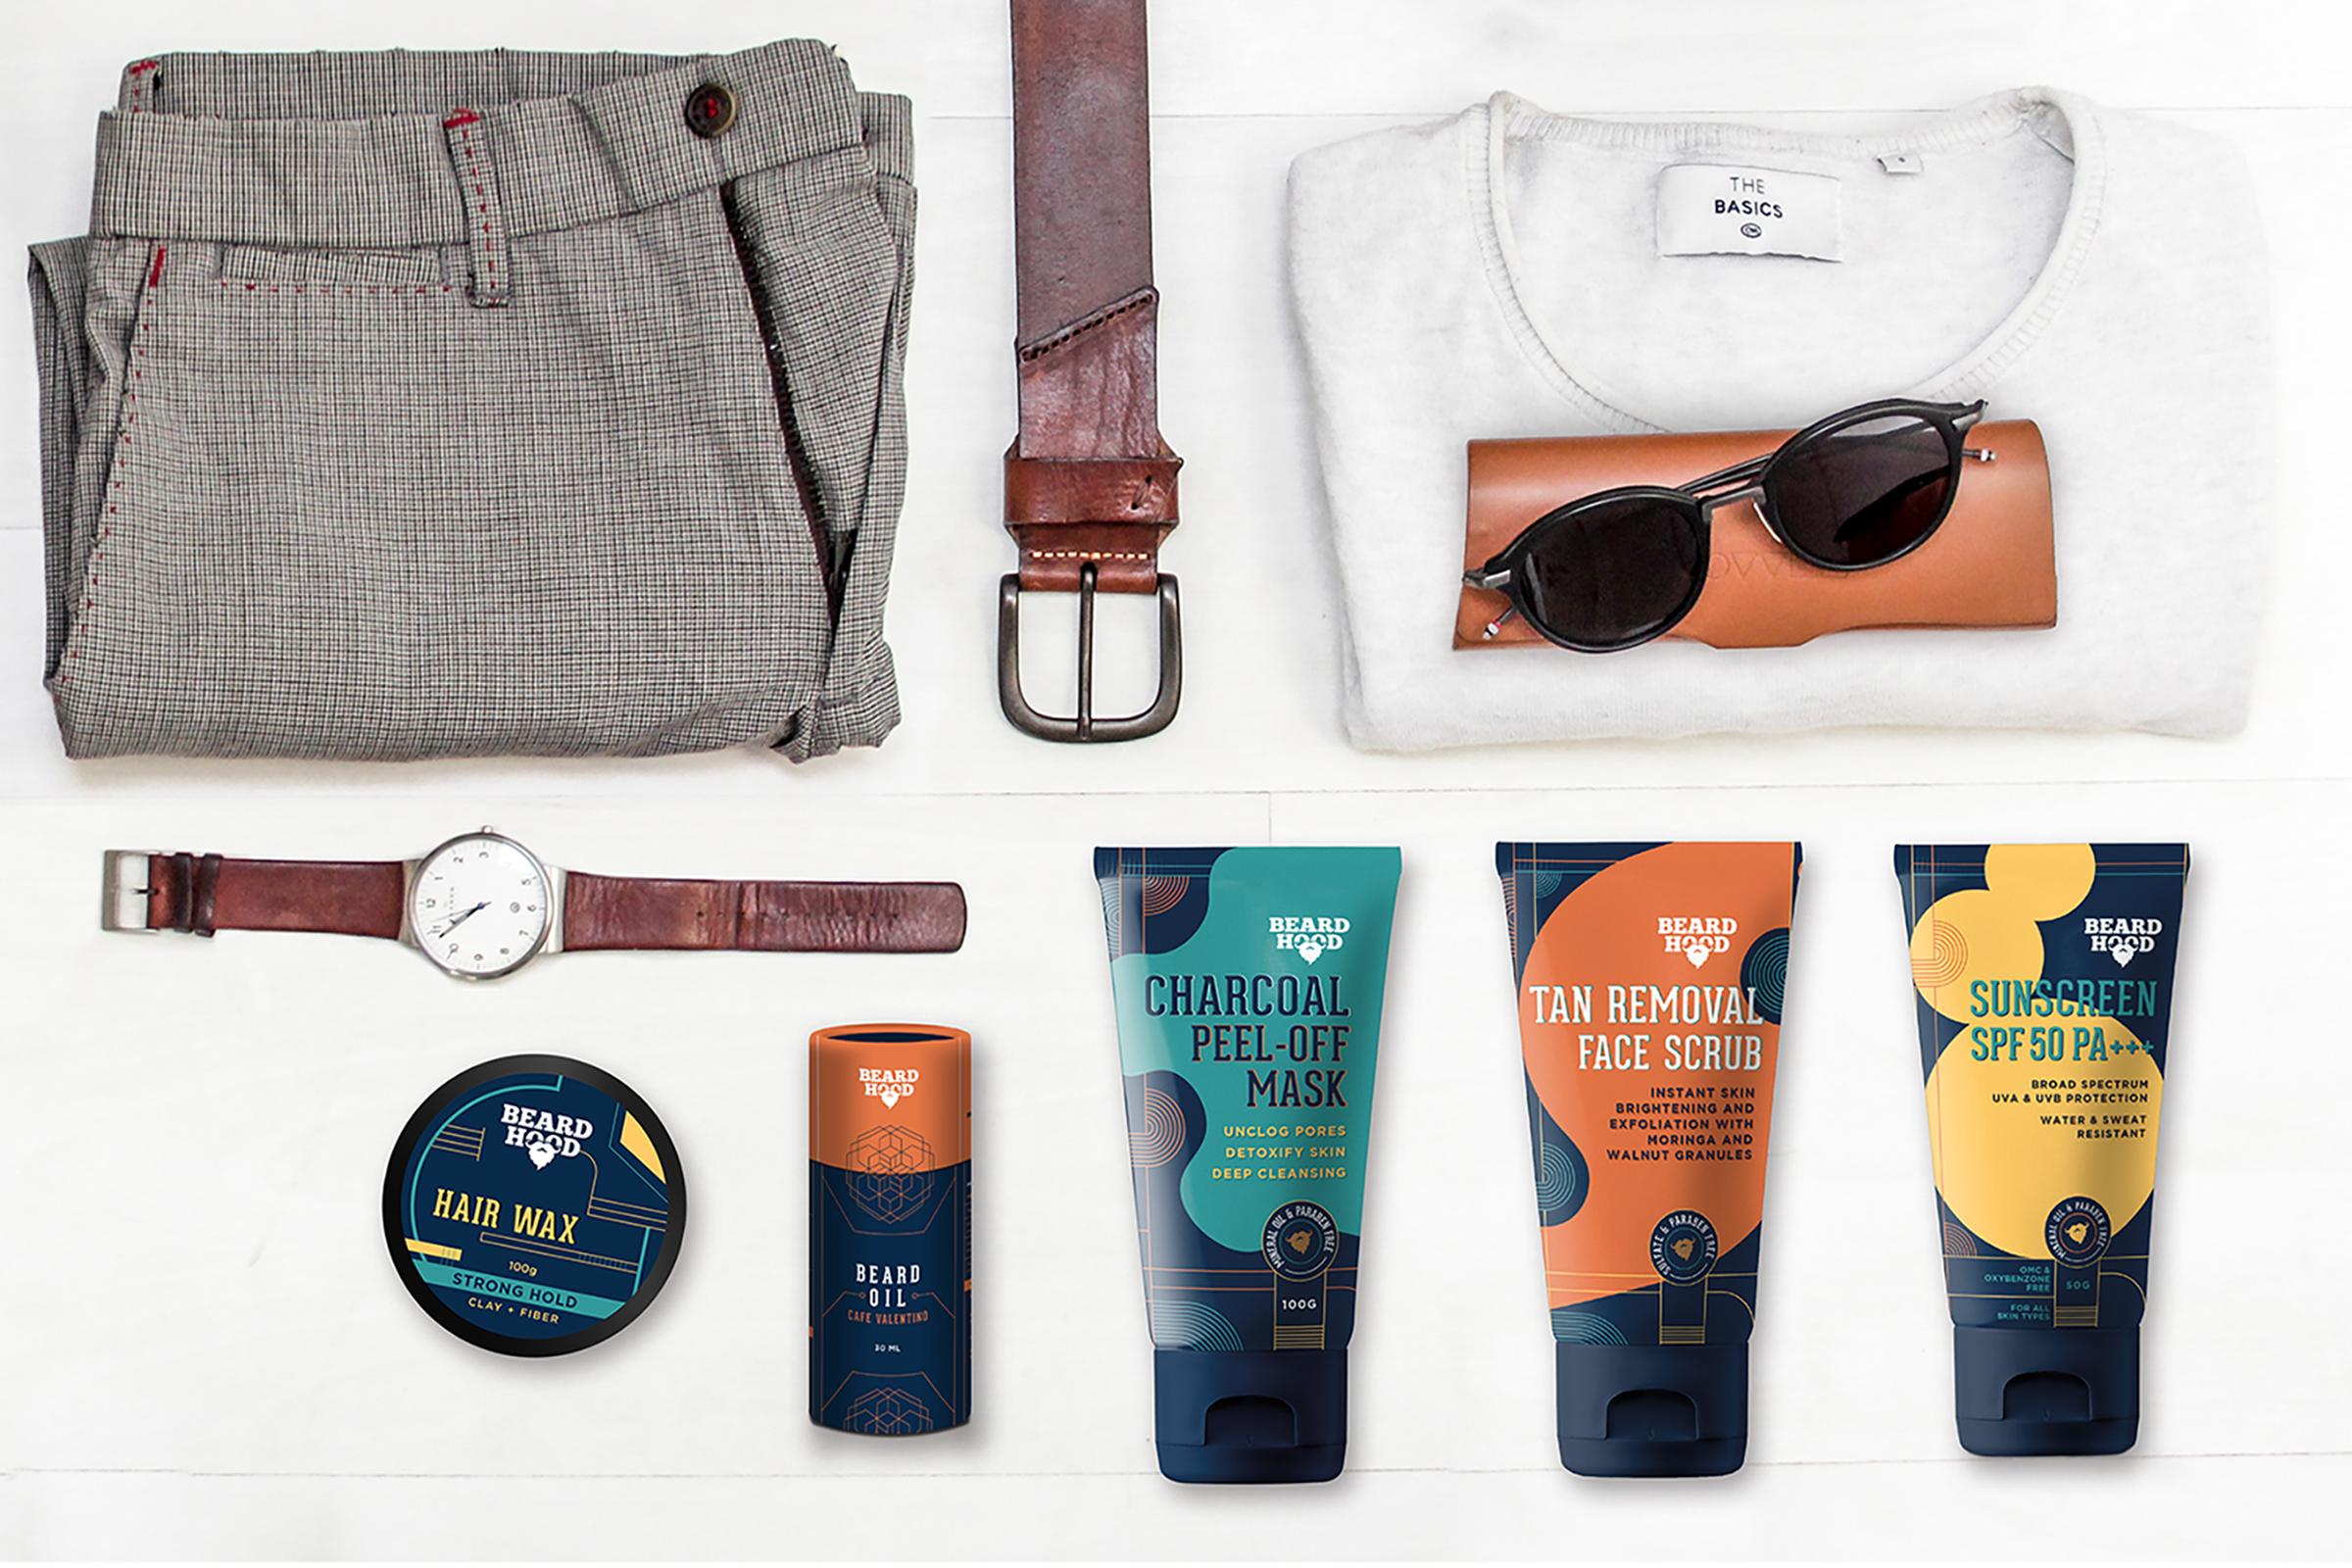 Stratedgy - Beard Hood Brand Project8.jpg